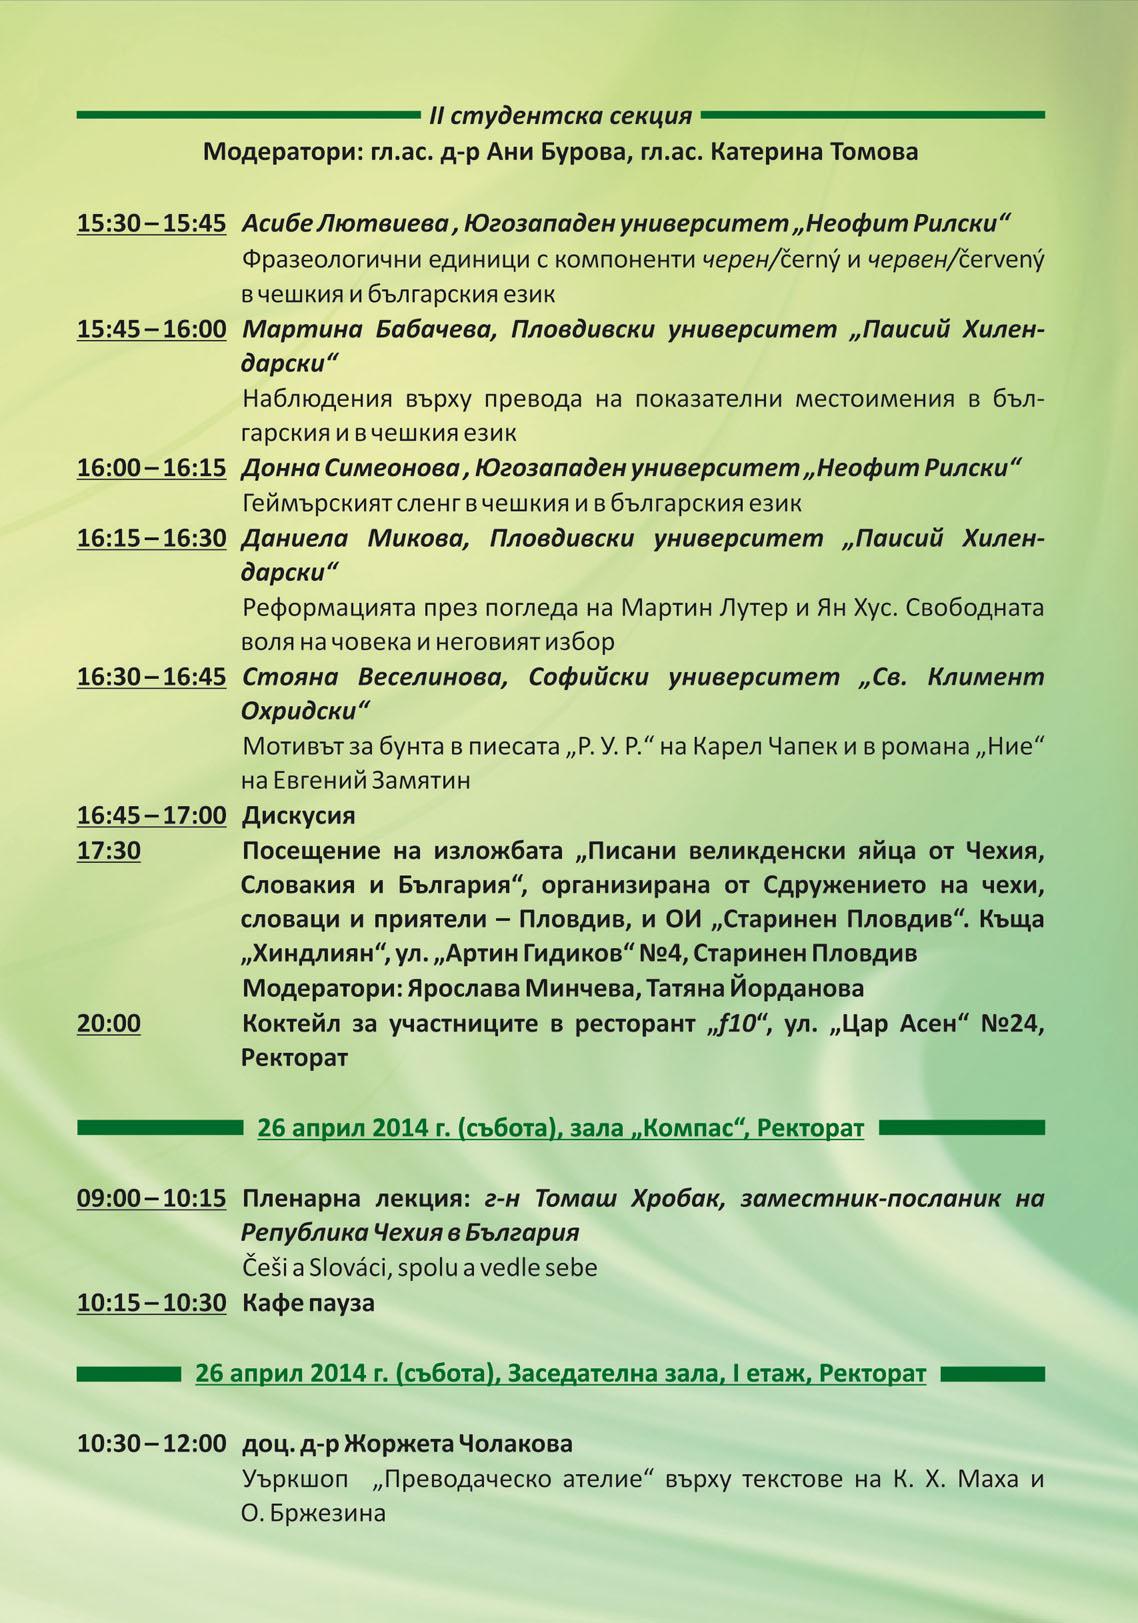 Programa-Filologia-A5-3